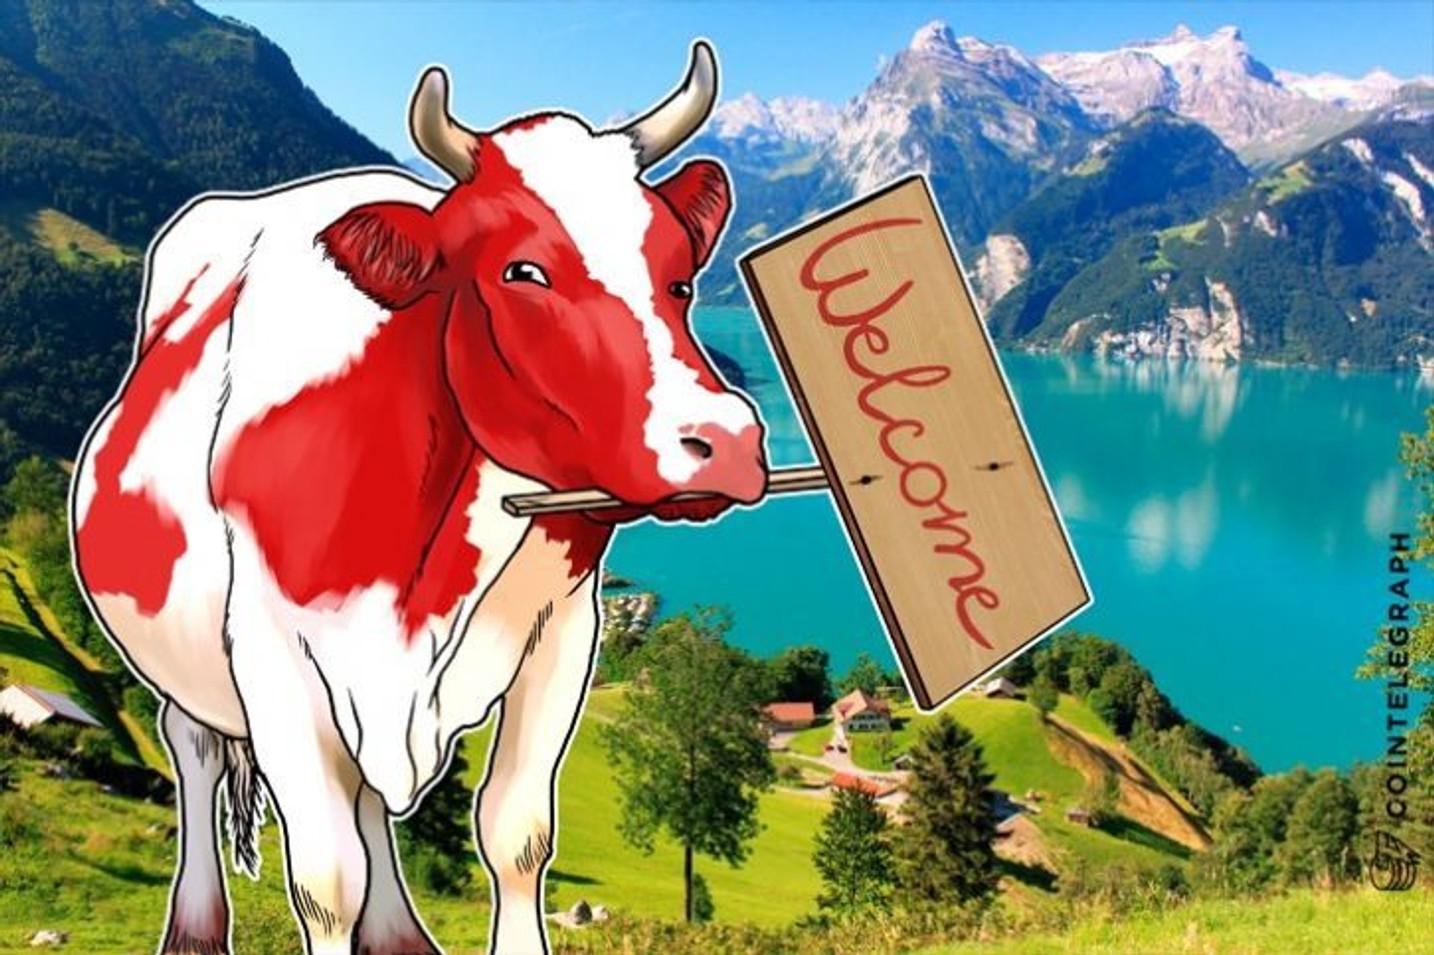 Switzerland Awards First AML/KYC Licence To Bitcoin Company